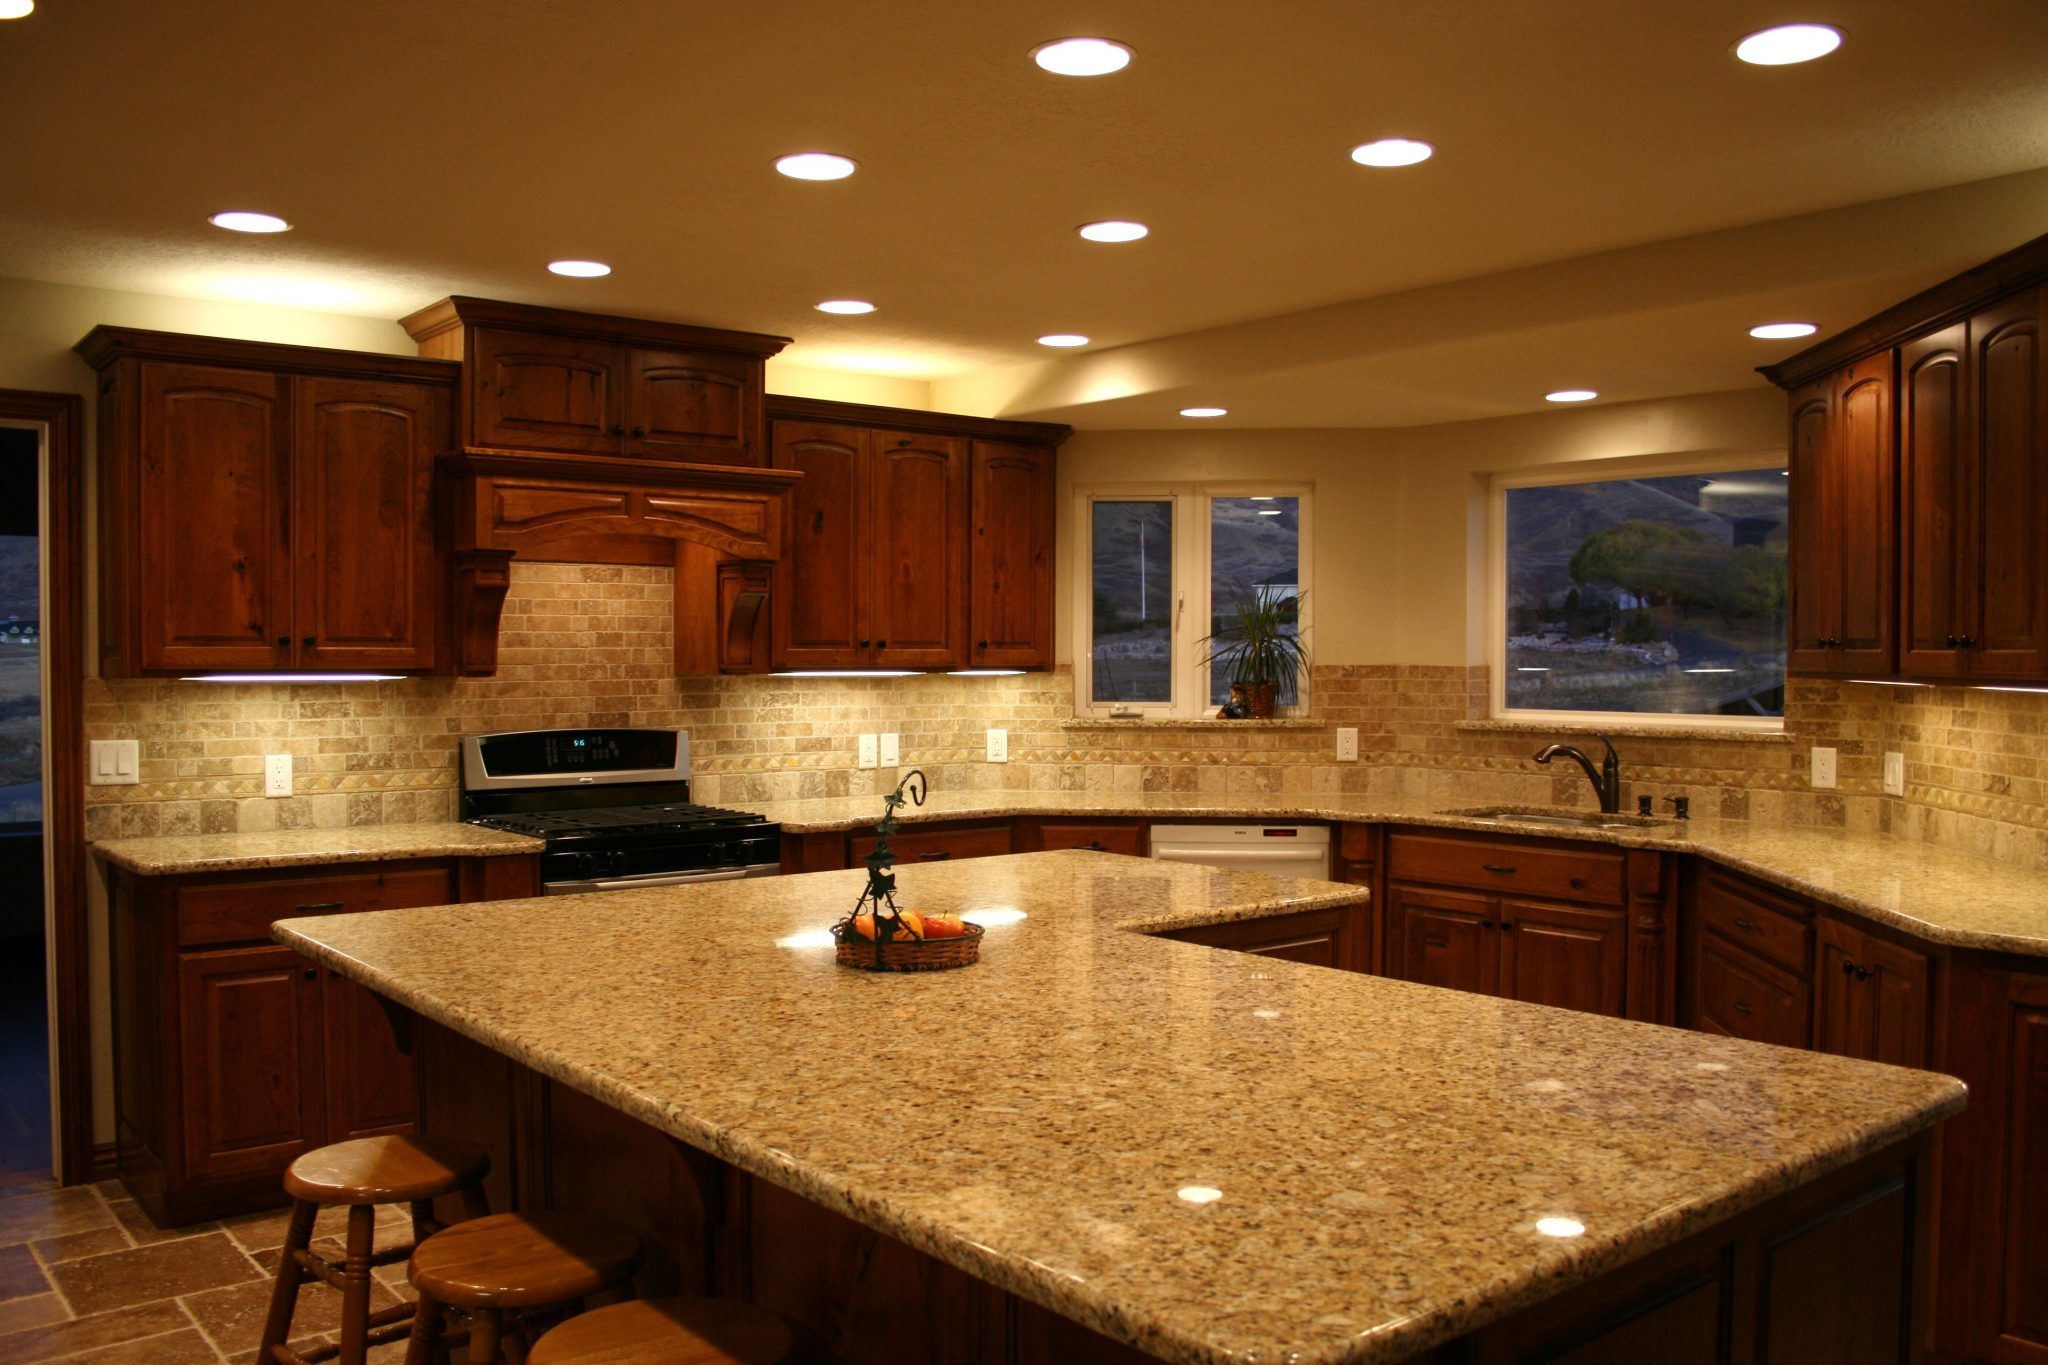 choosing stock special order semi custom custom kitchen cabinets granite countertops kitchen Preserve Granite Kitchen Counters